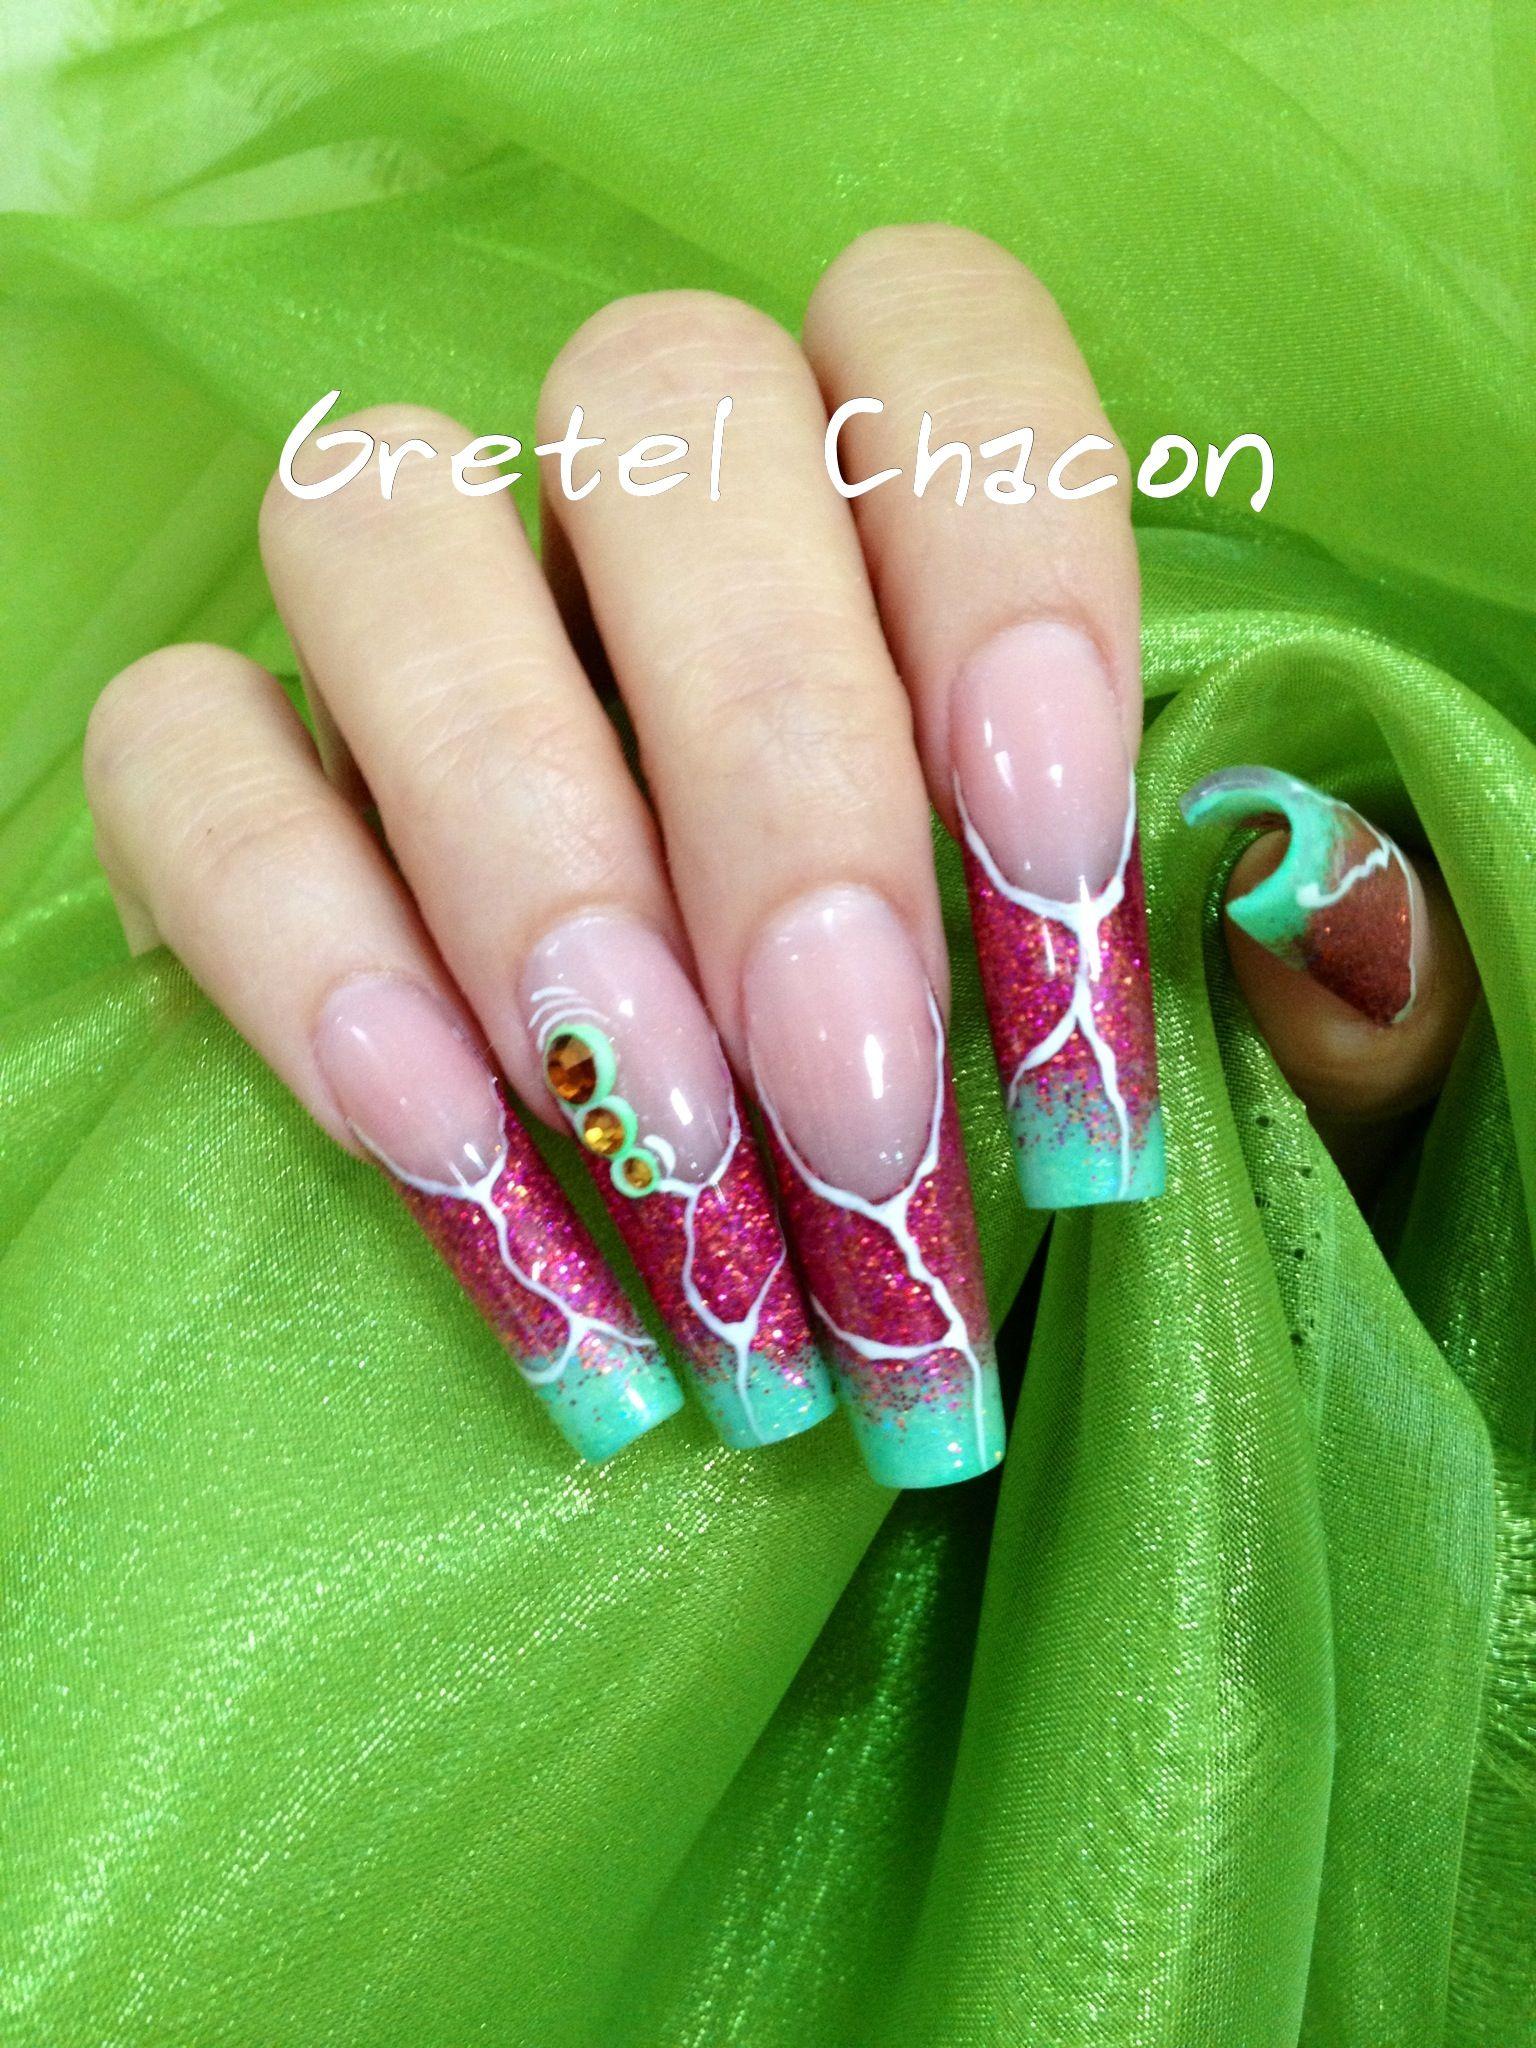 Punta Europea | Las mejores uñas | Pinterest | Mejores uñas, Aries y ...